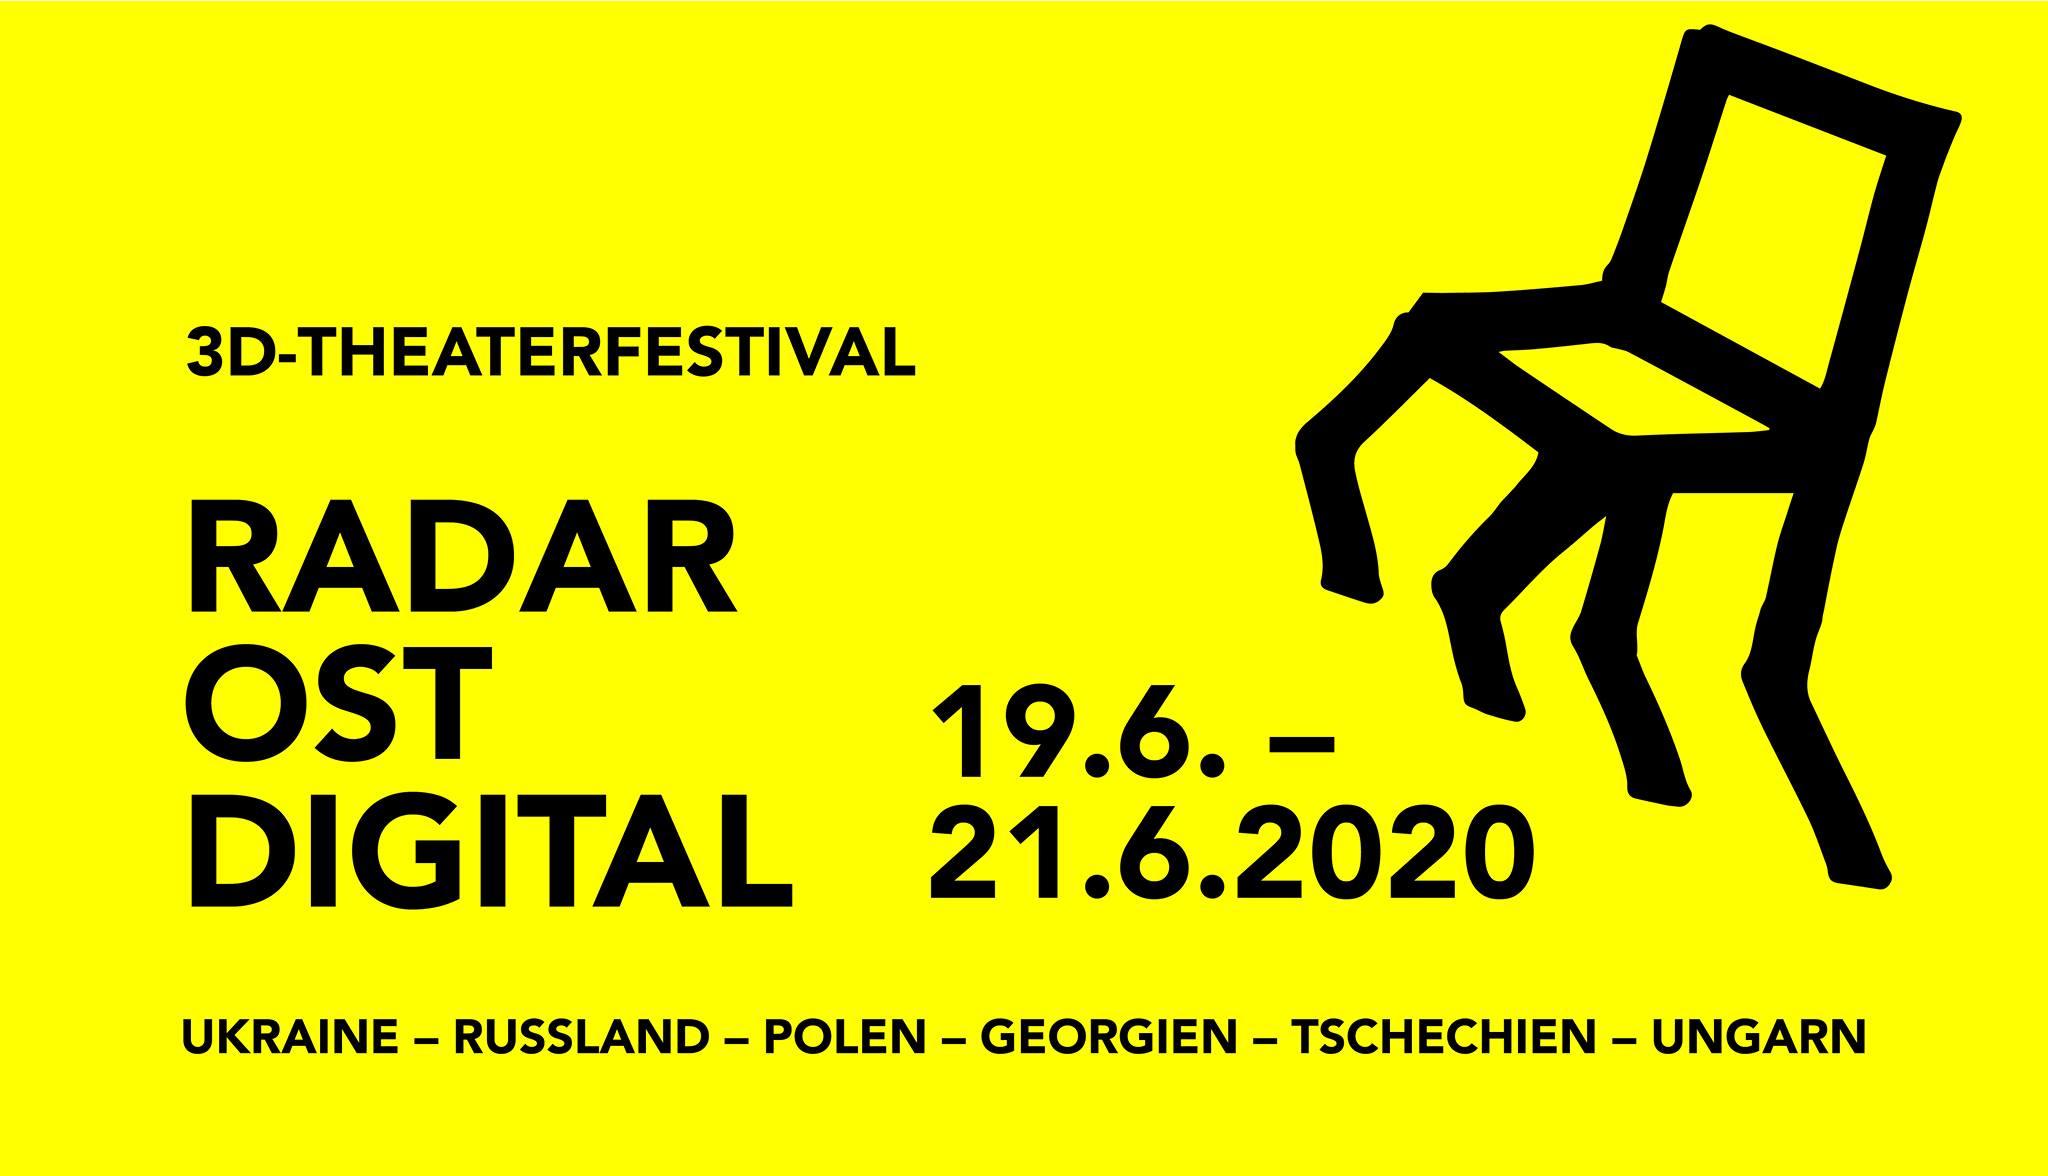 Queendom special edition @Radar Ost Digital | 3D-Theaterfestival / 2020.06.19-21.